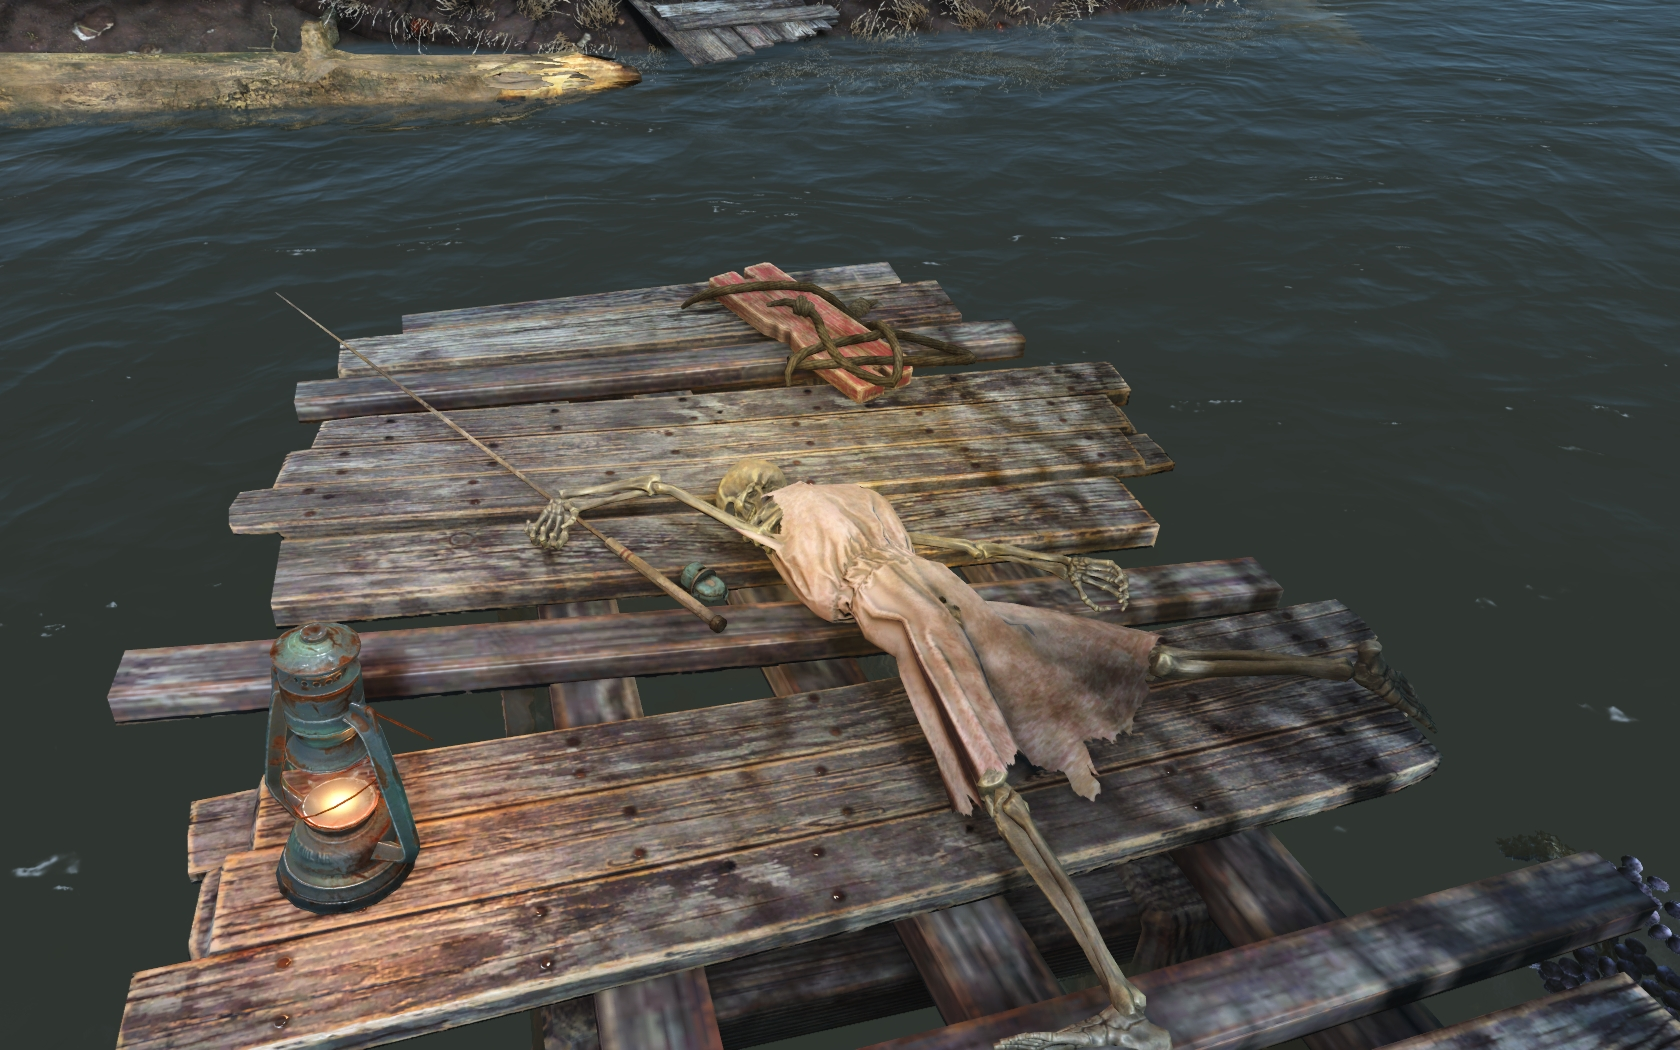 Мадам рыбачит (севернее Сэнкчуари) - Fallout 4 скелет, Юмор